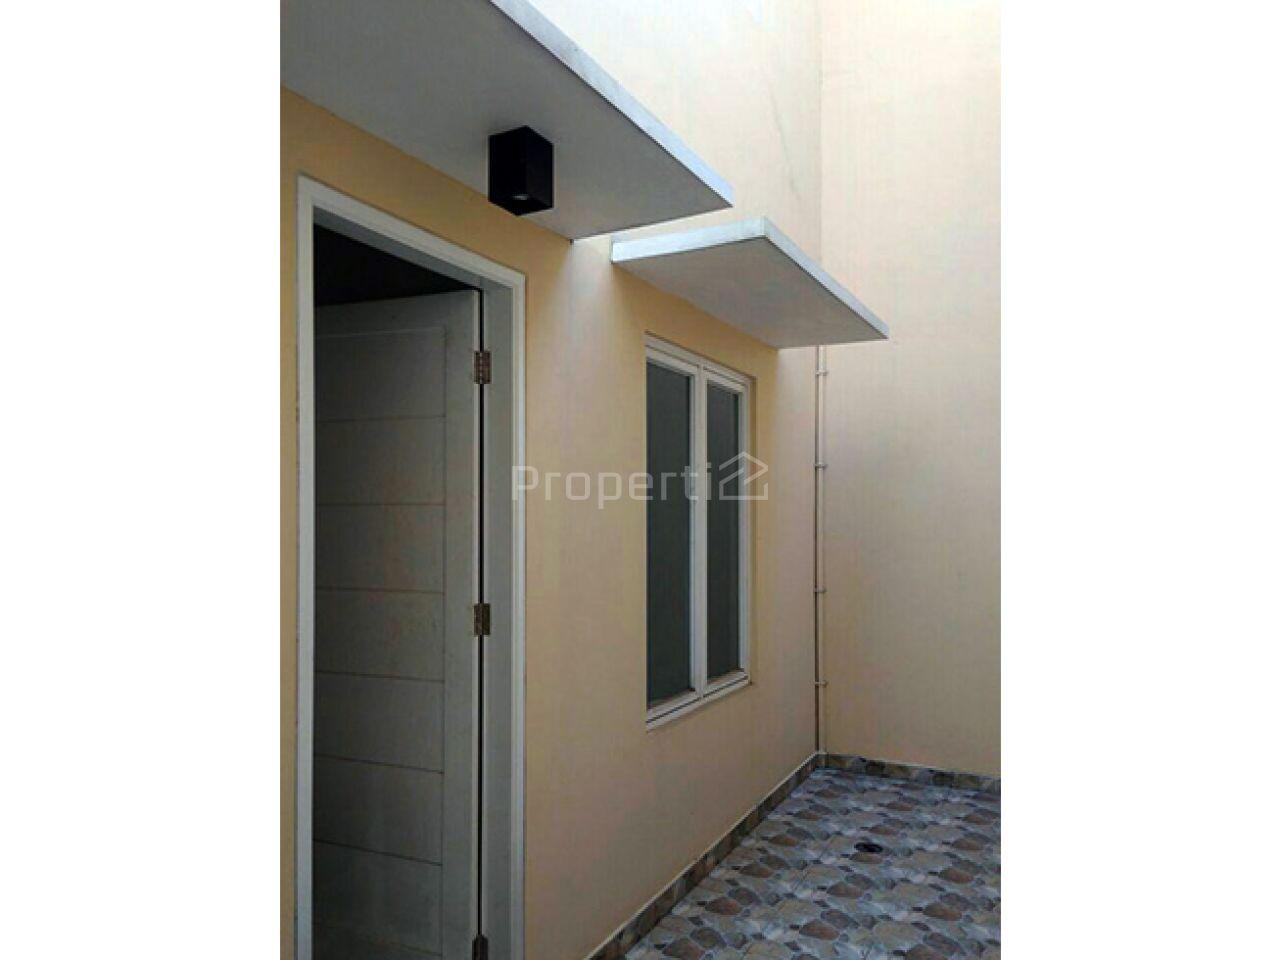 Rumah Baru 2 Lantai di Belakang Santa Maria Slipi, Tanah Abang